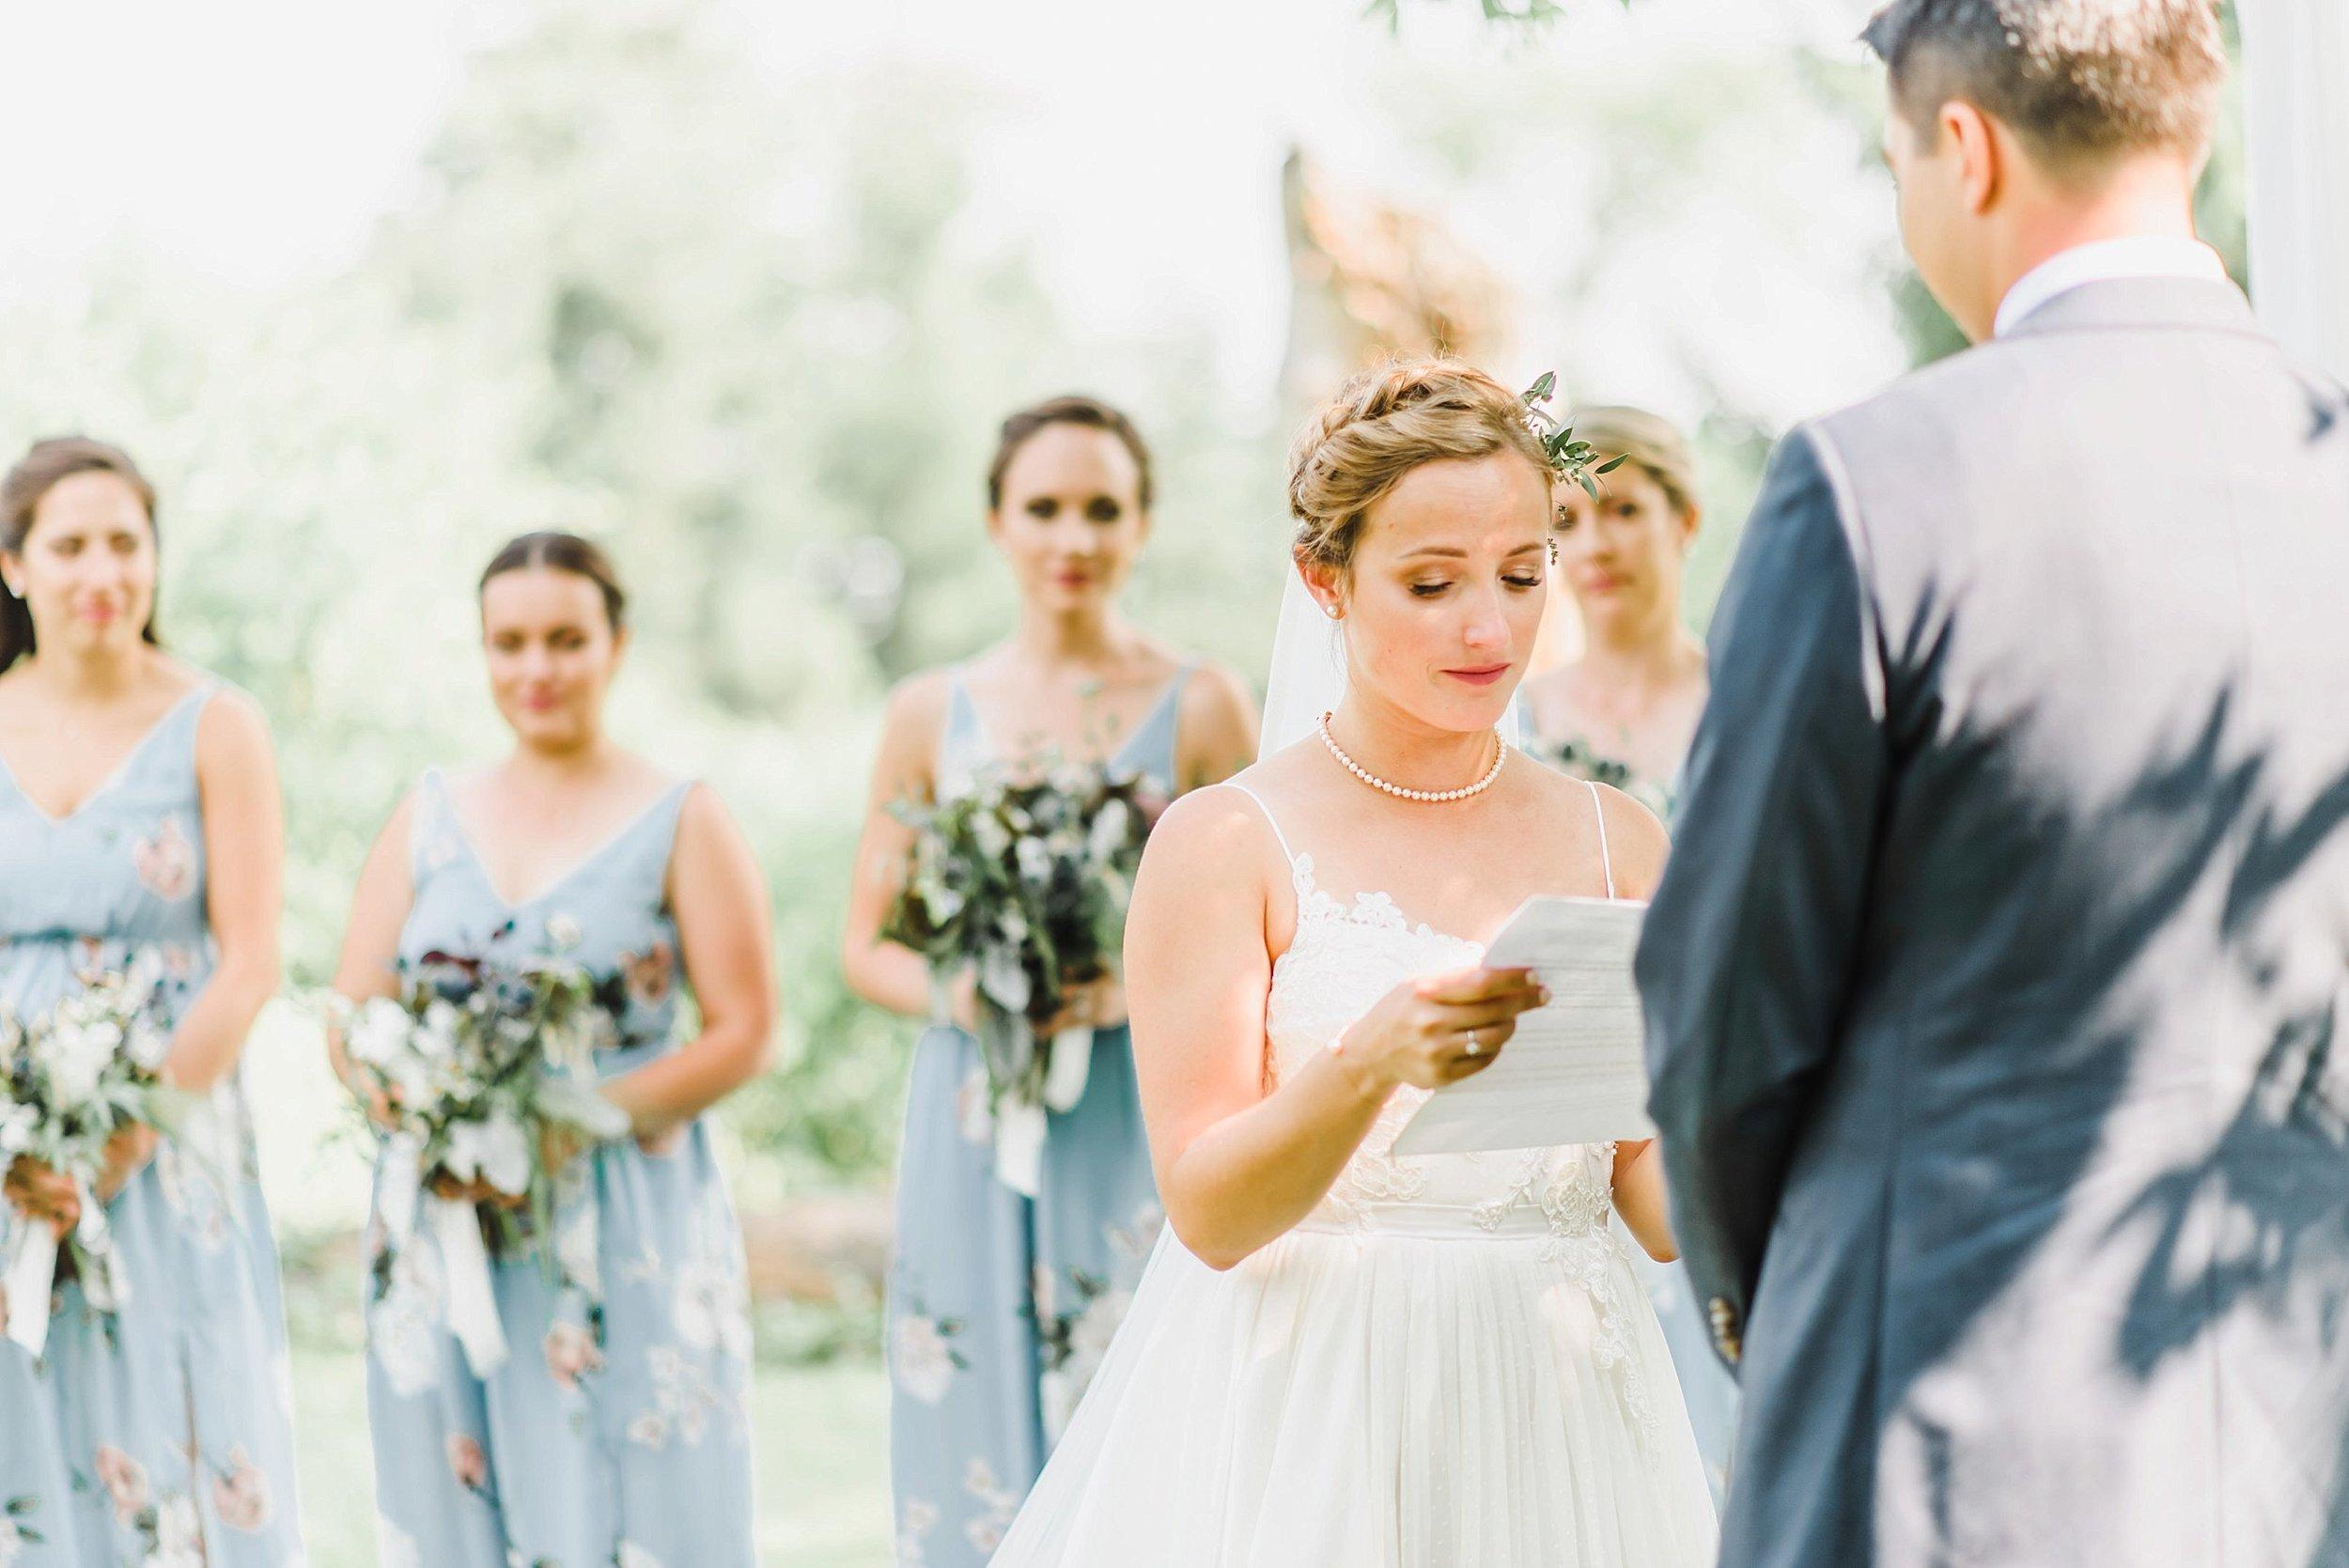 light airy indie fine art ottawa wedding photographer | Ali and Batoul Photography_0814.jpg